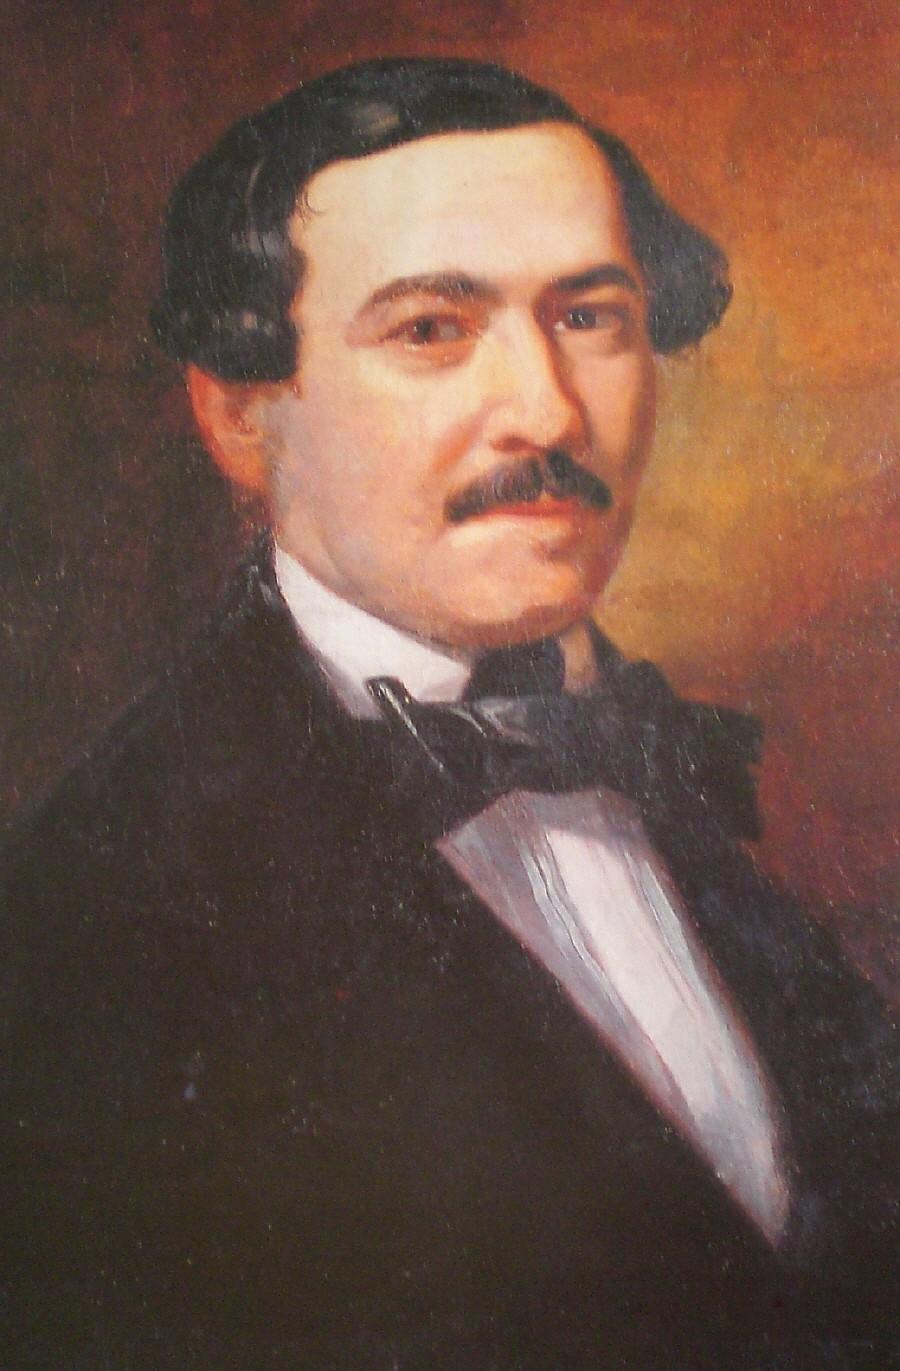 Image result for rafael maria baralt pintura del siglo 19